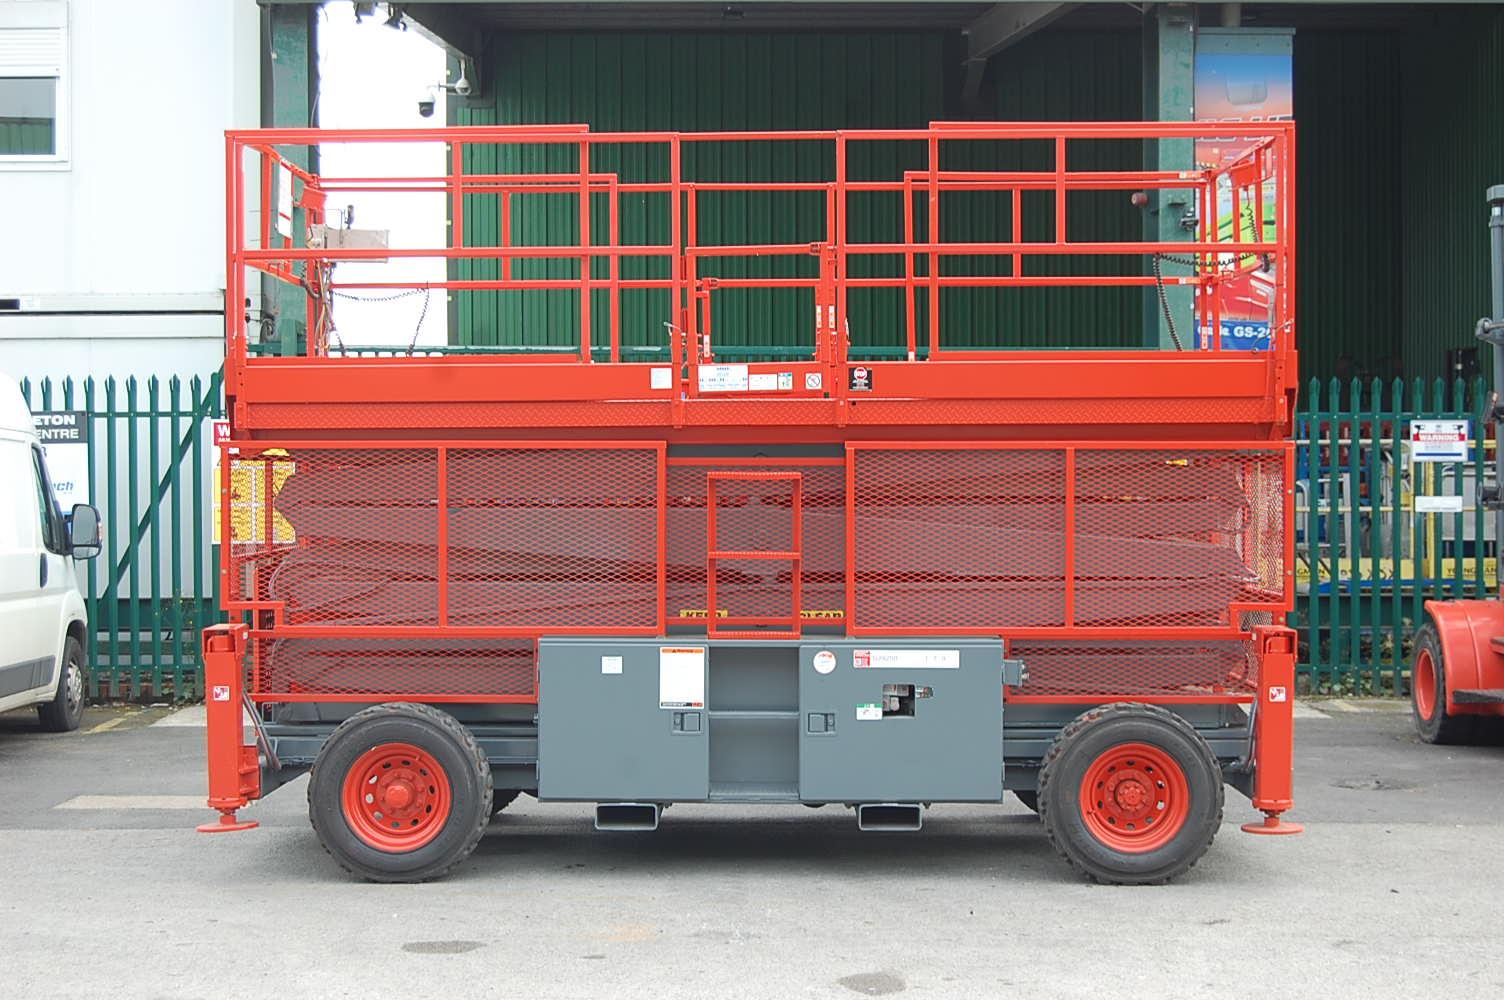 2007 Skyjack 9250 Rough Terrain Diesel Scissor Lift 17m